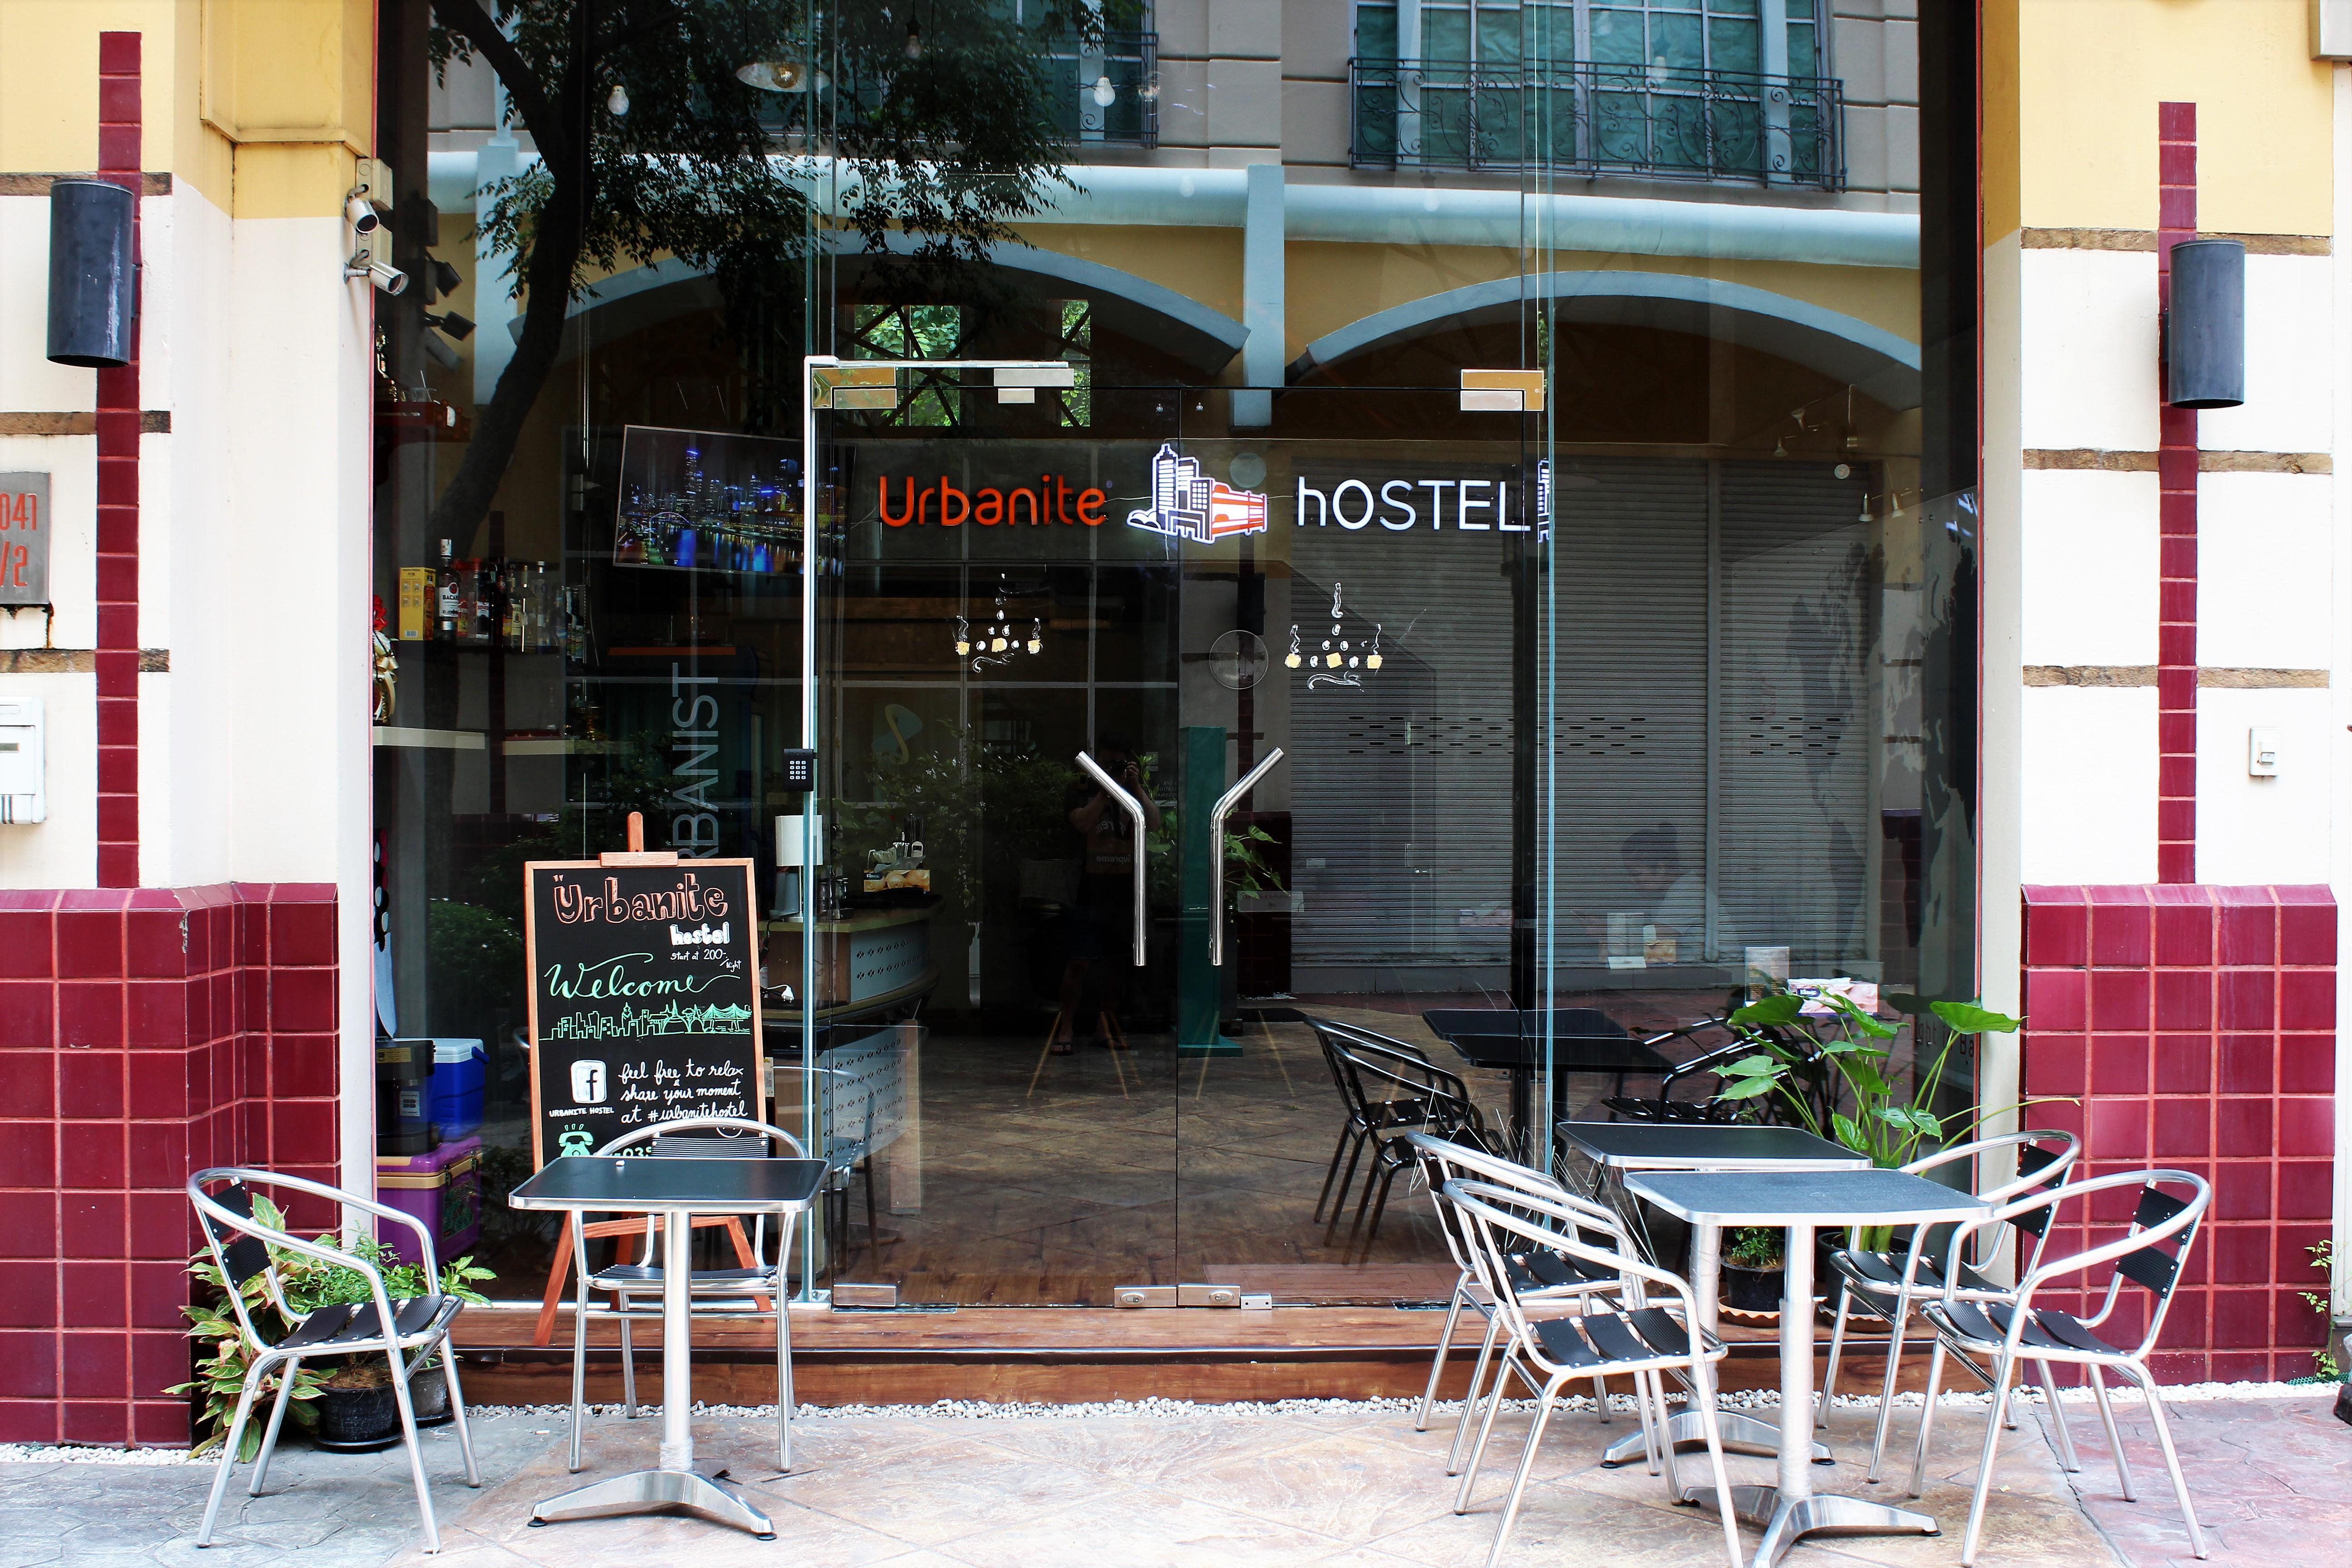 Urbanite Hostel